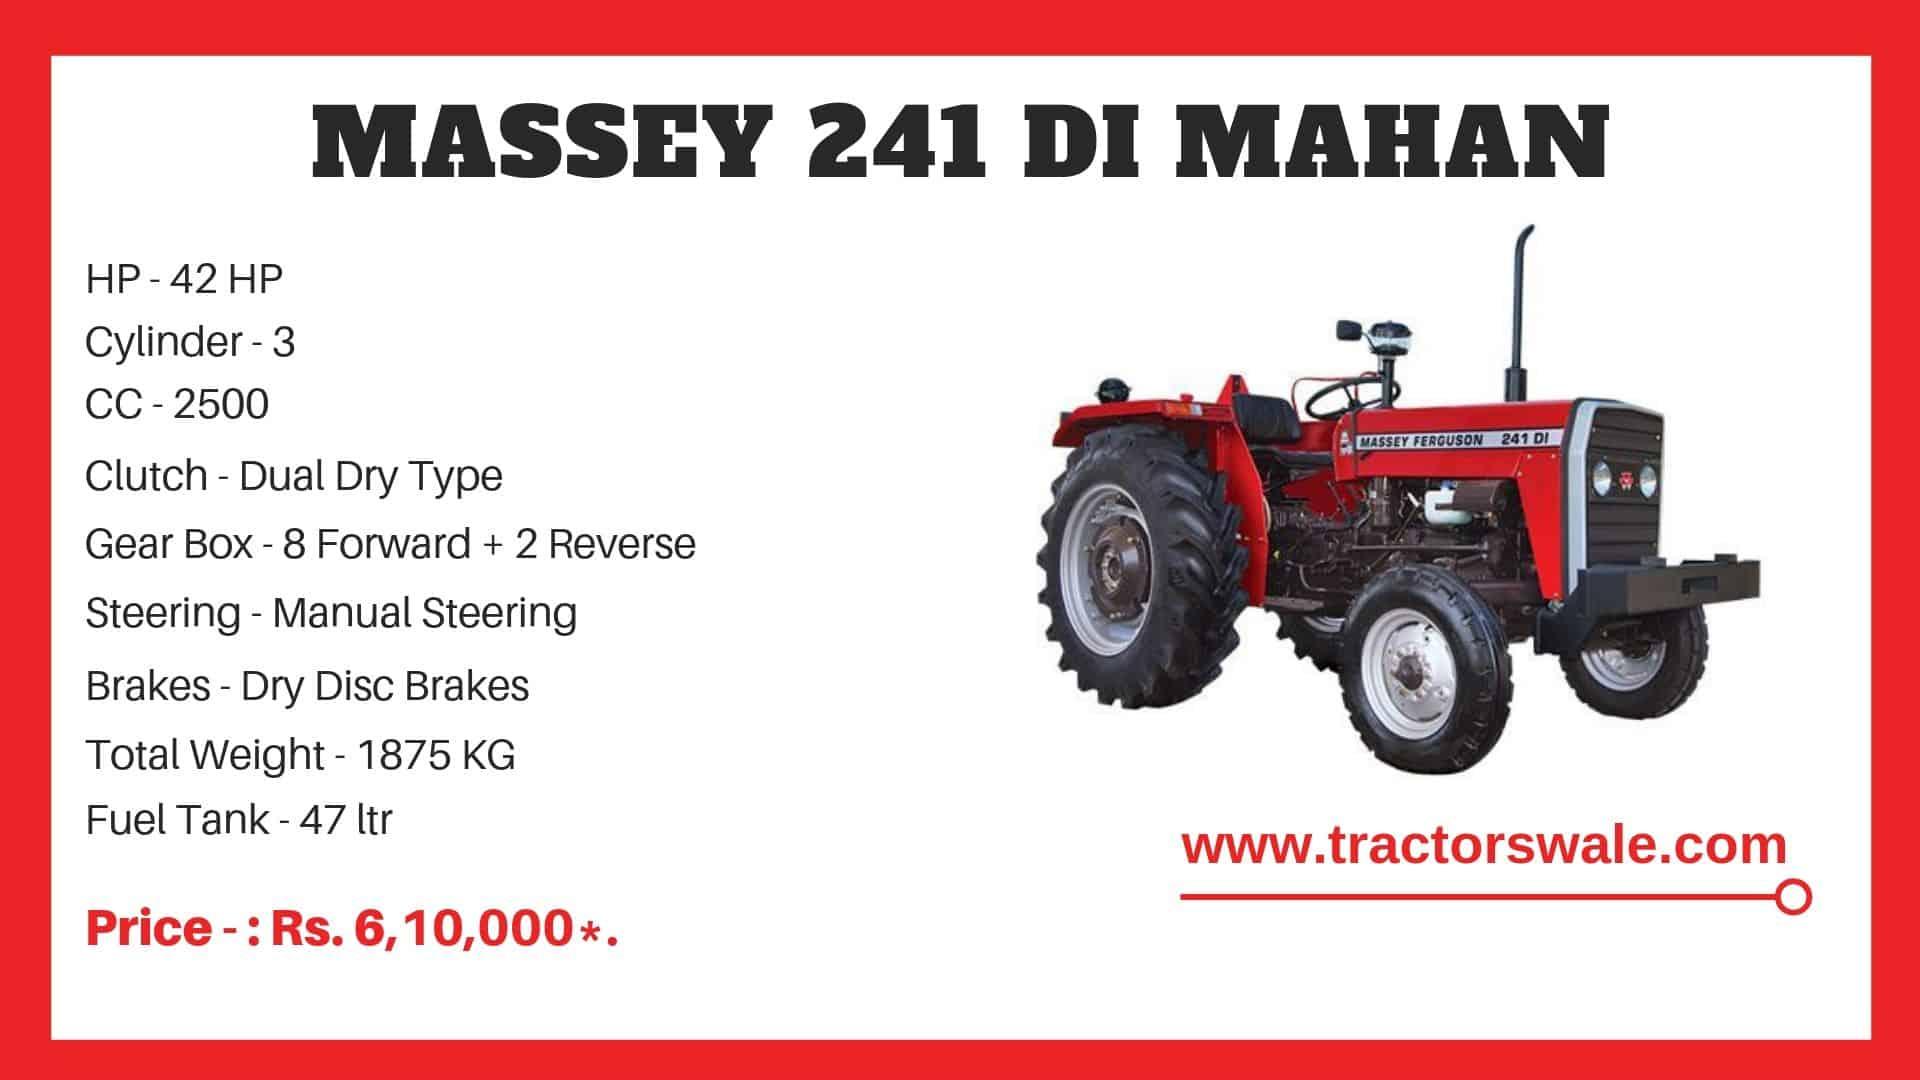 Massey Ferguson 241 DI MAHAN Specifications